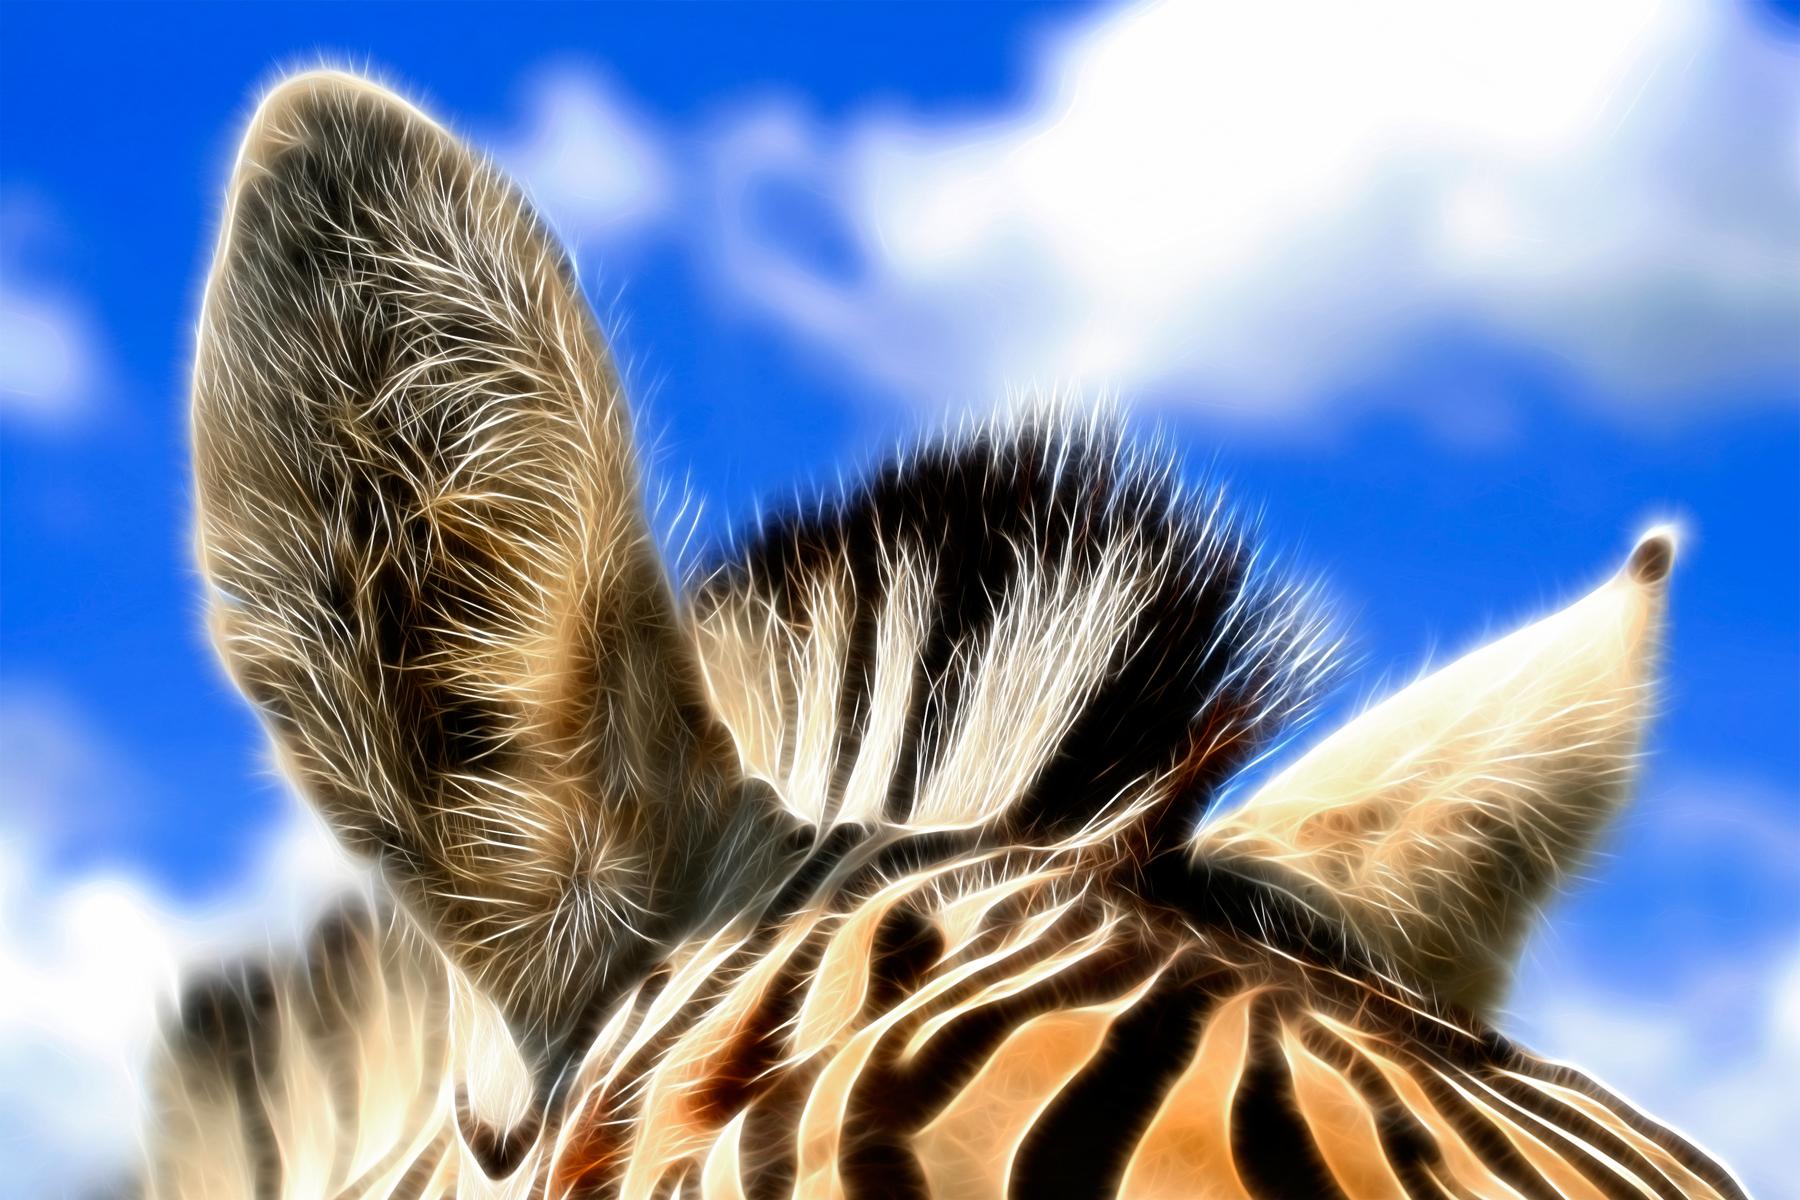 Zebra Ears Abstract, Abstract, Ruminant, Maroon, Natural, HQ Photo